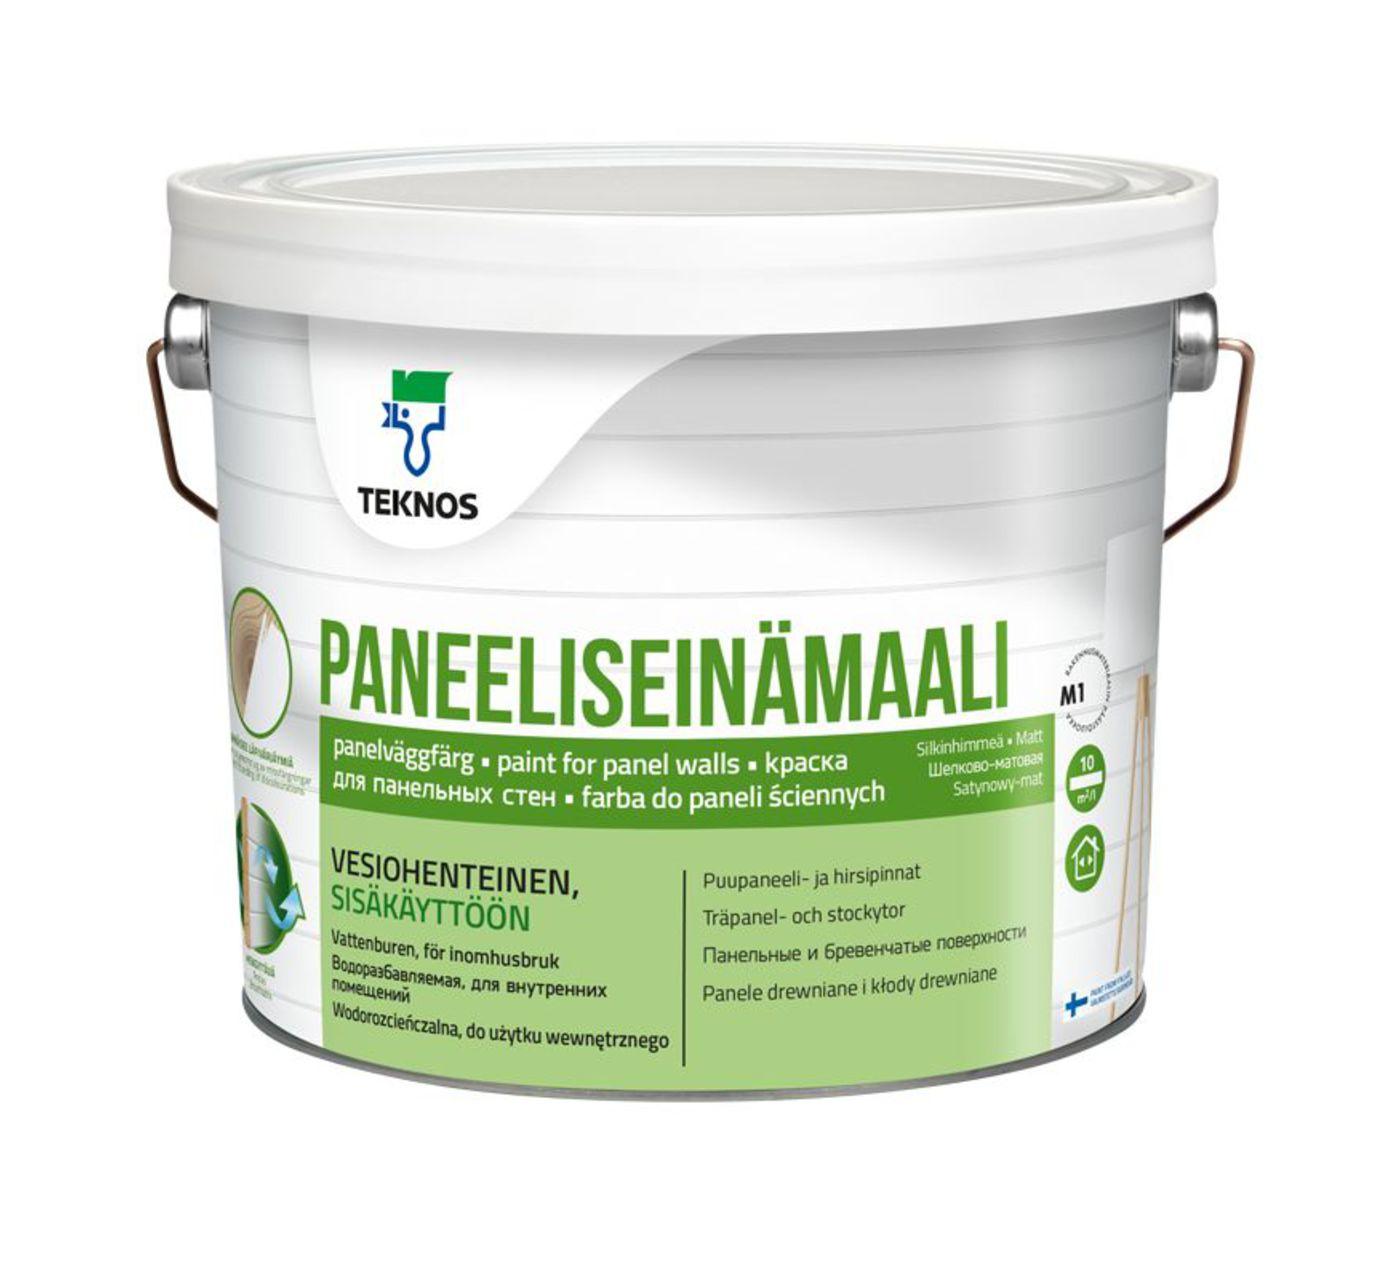 PANEELISEINÄMAALI Краска для панельных стен